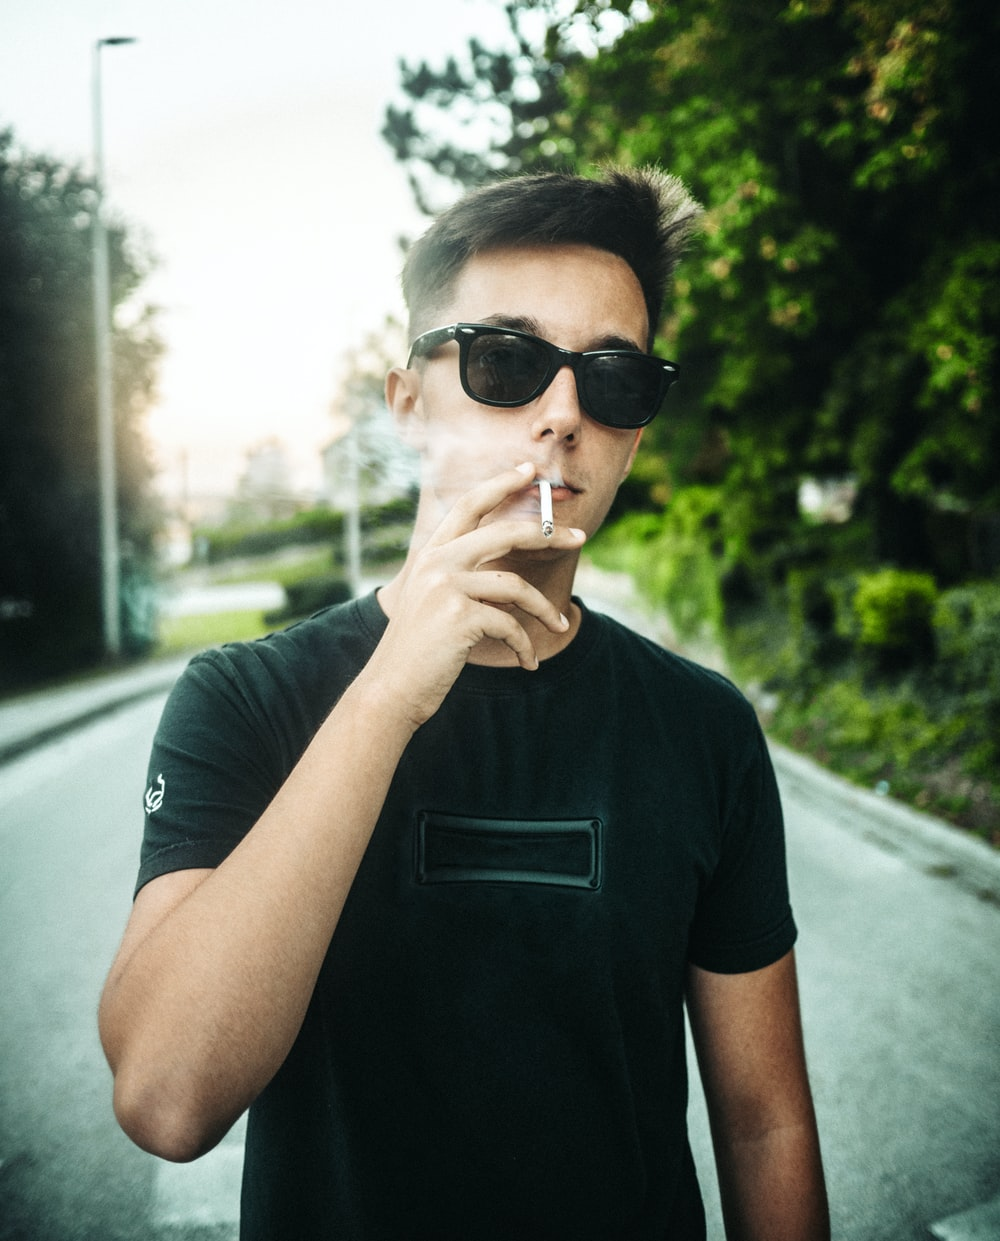 man in black crew neck t-shirt wearing black sunglasses